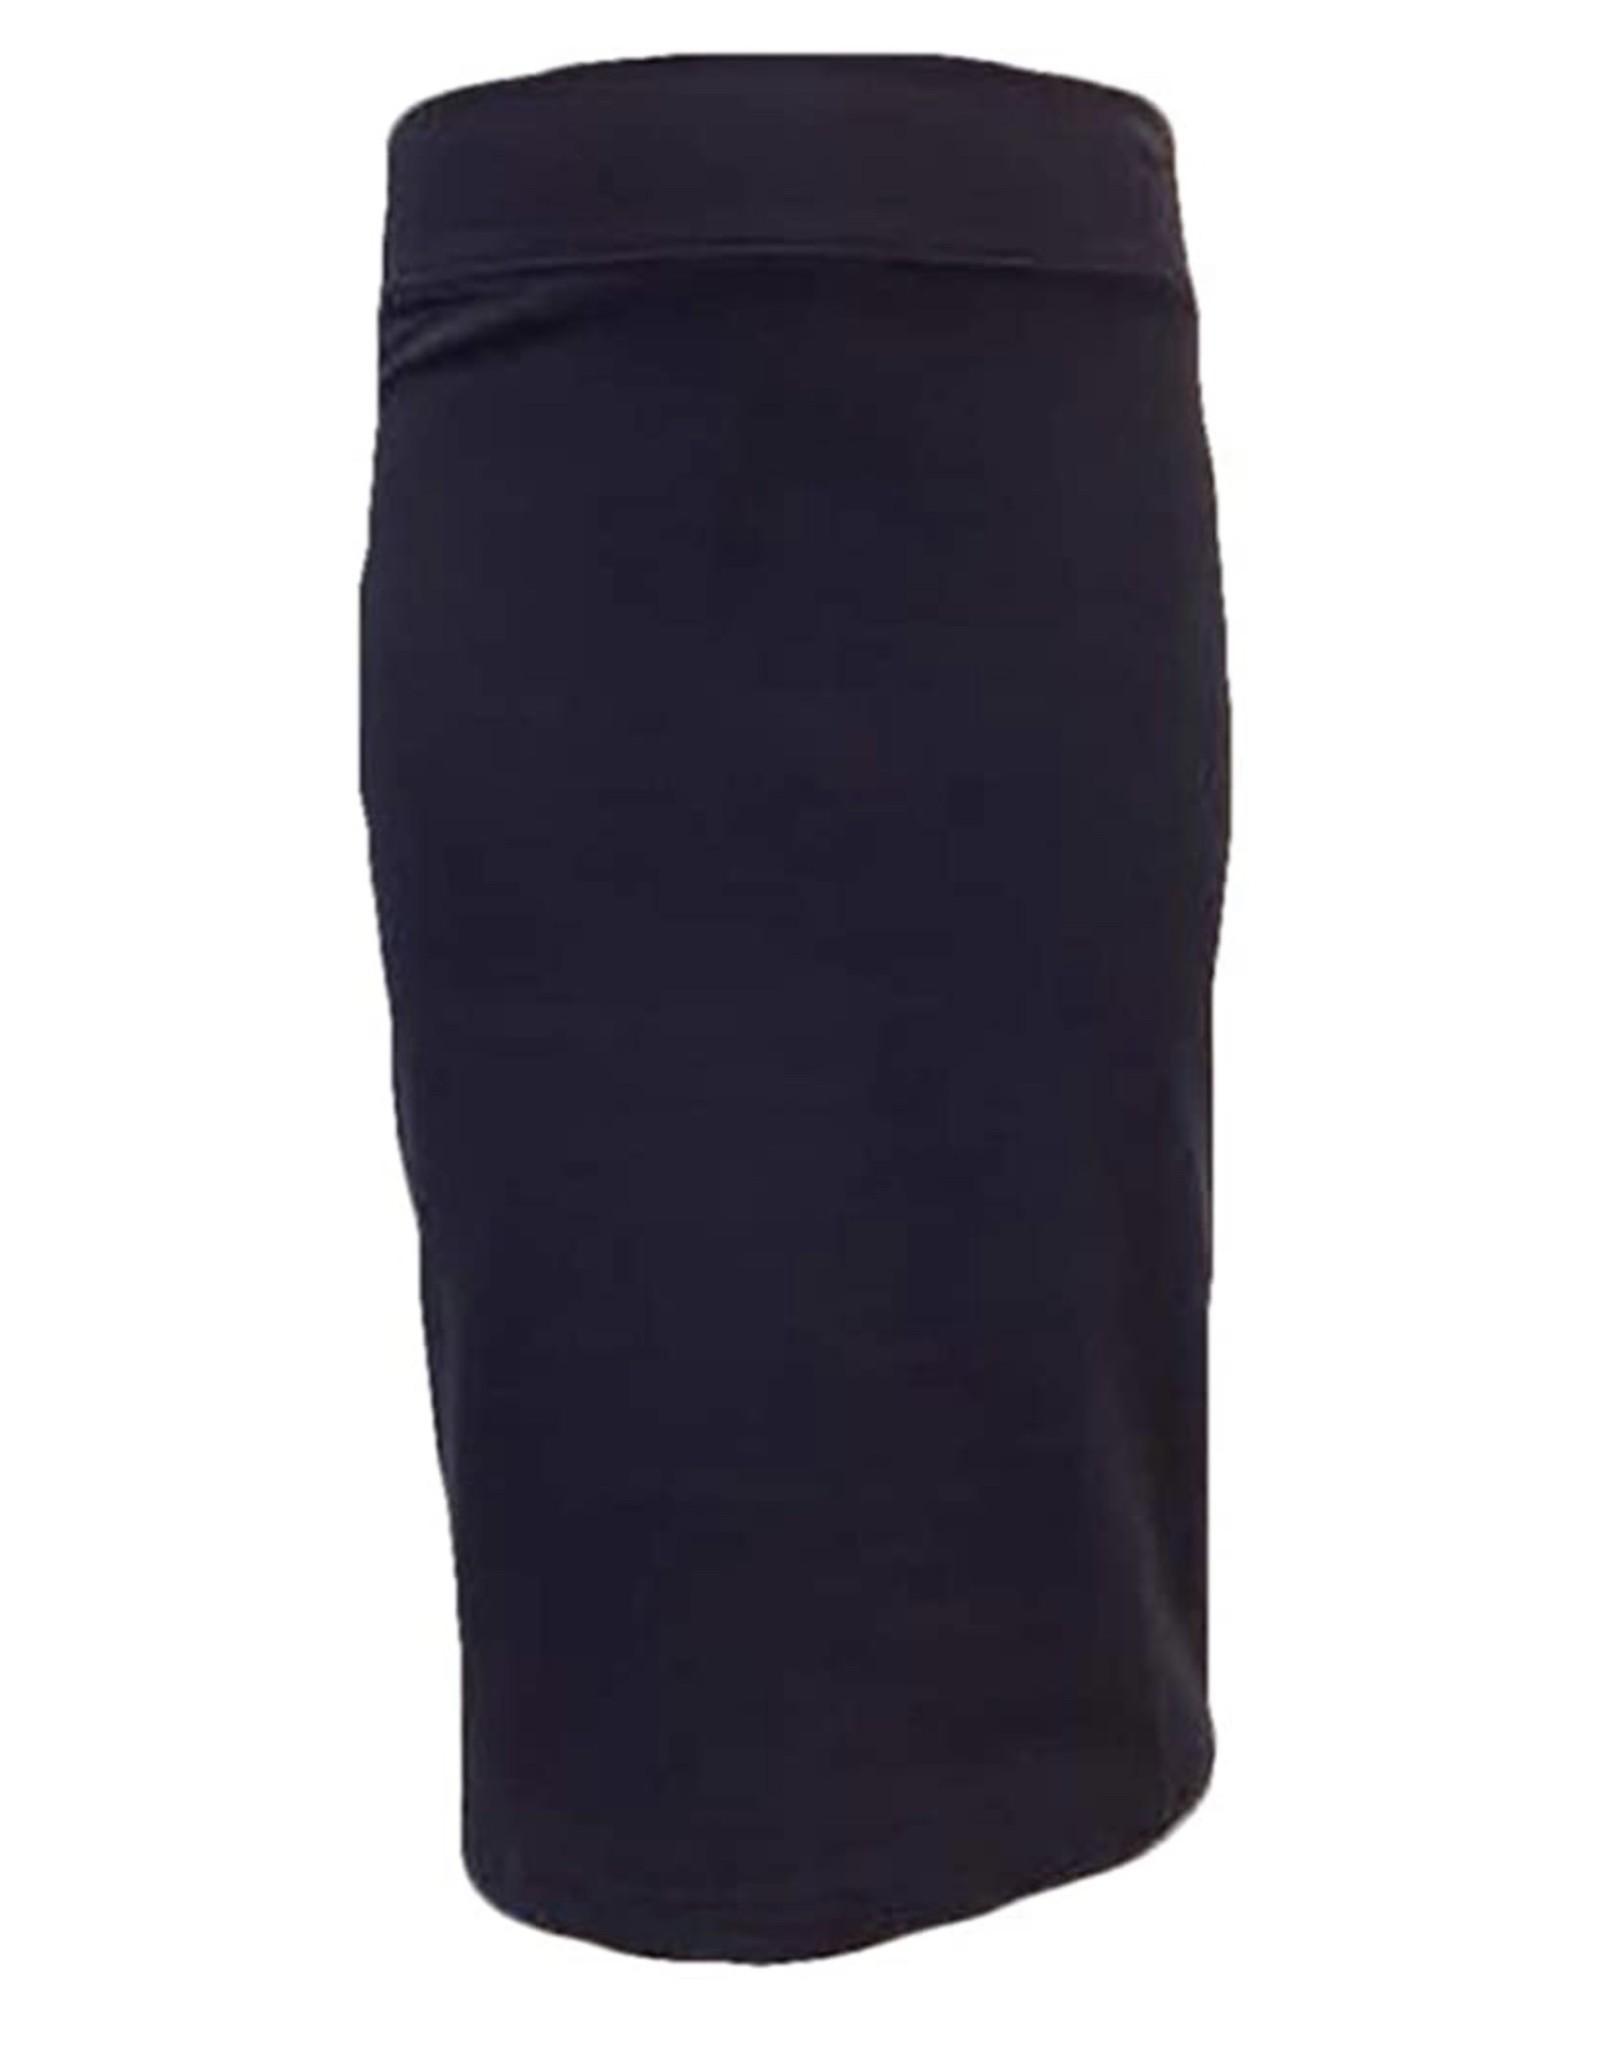 Kiki Riki Kiki Riki Women's Pencil Skirt 4823